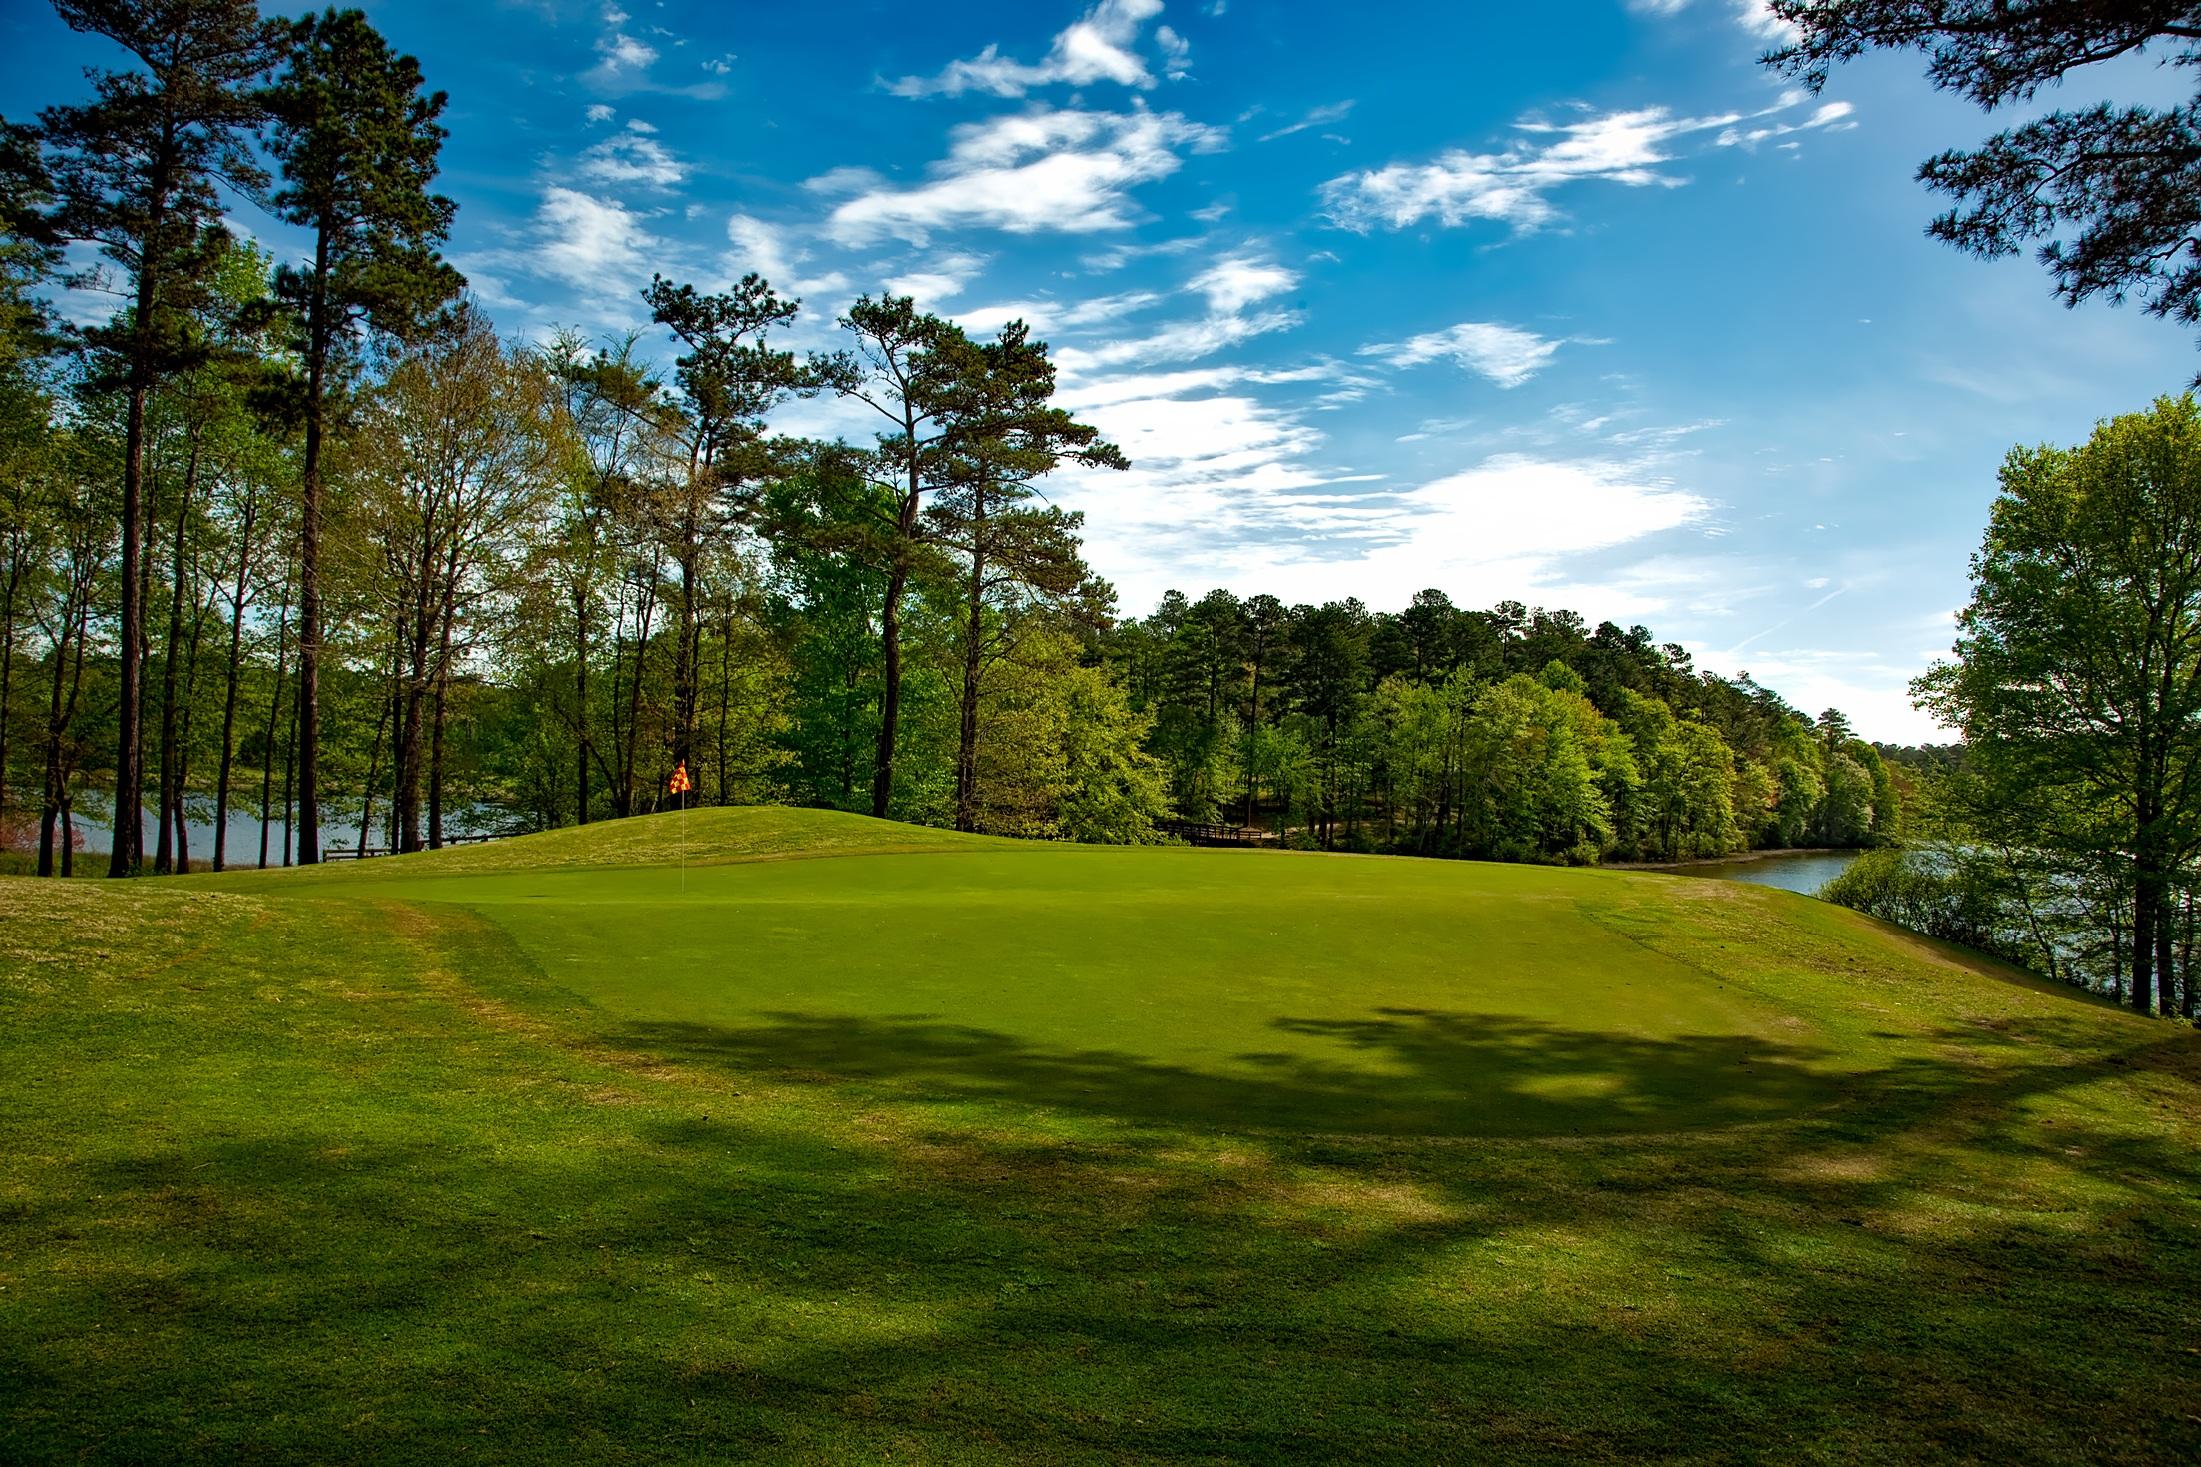 grass field. Shadow, Blue Sky, Golf Course, Club, Trees, Woods, Clouds, Sports, Grassland, Estate, Woodland, Grass Land, Field, Outdoor Recreation, Field 4